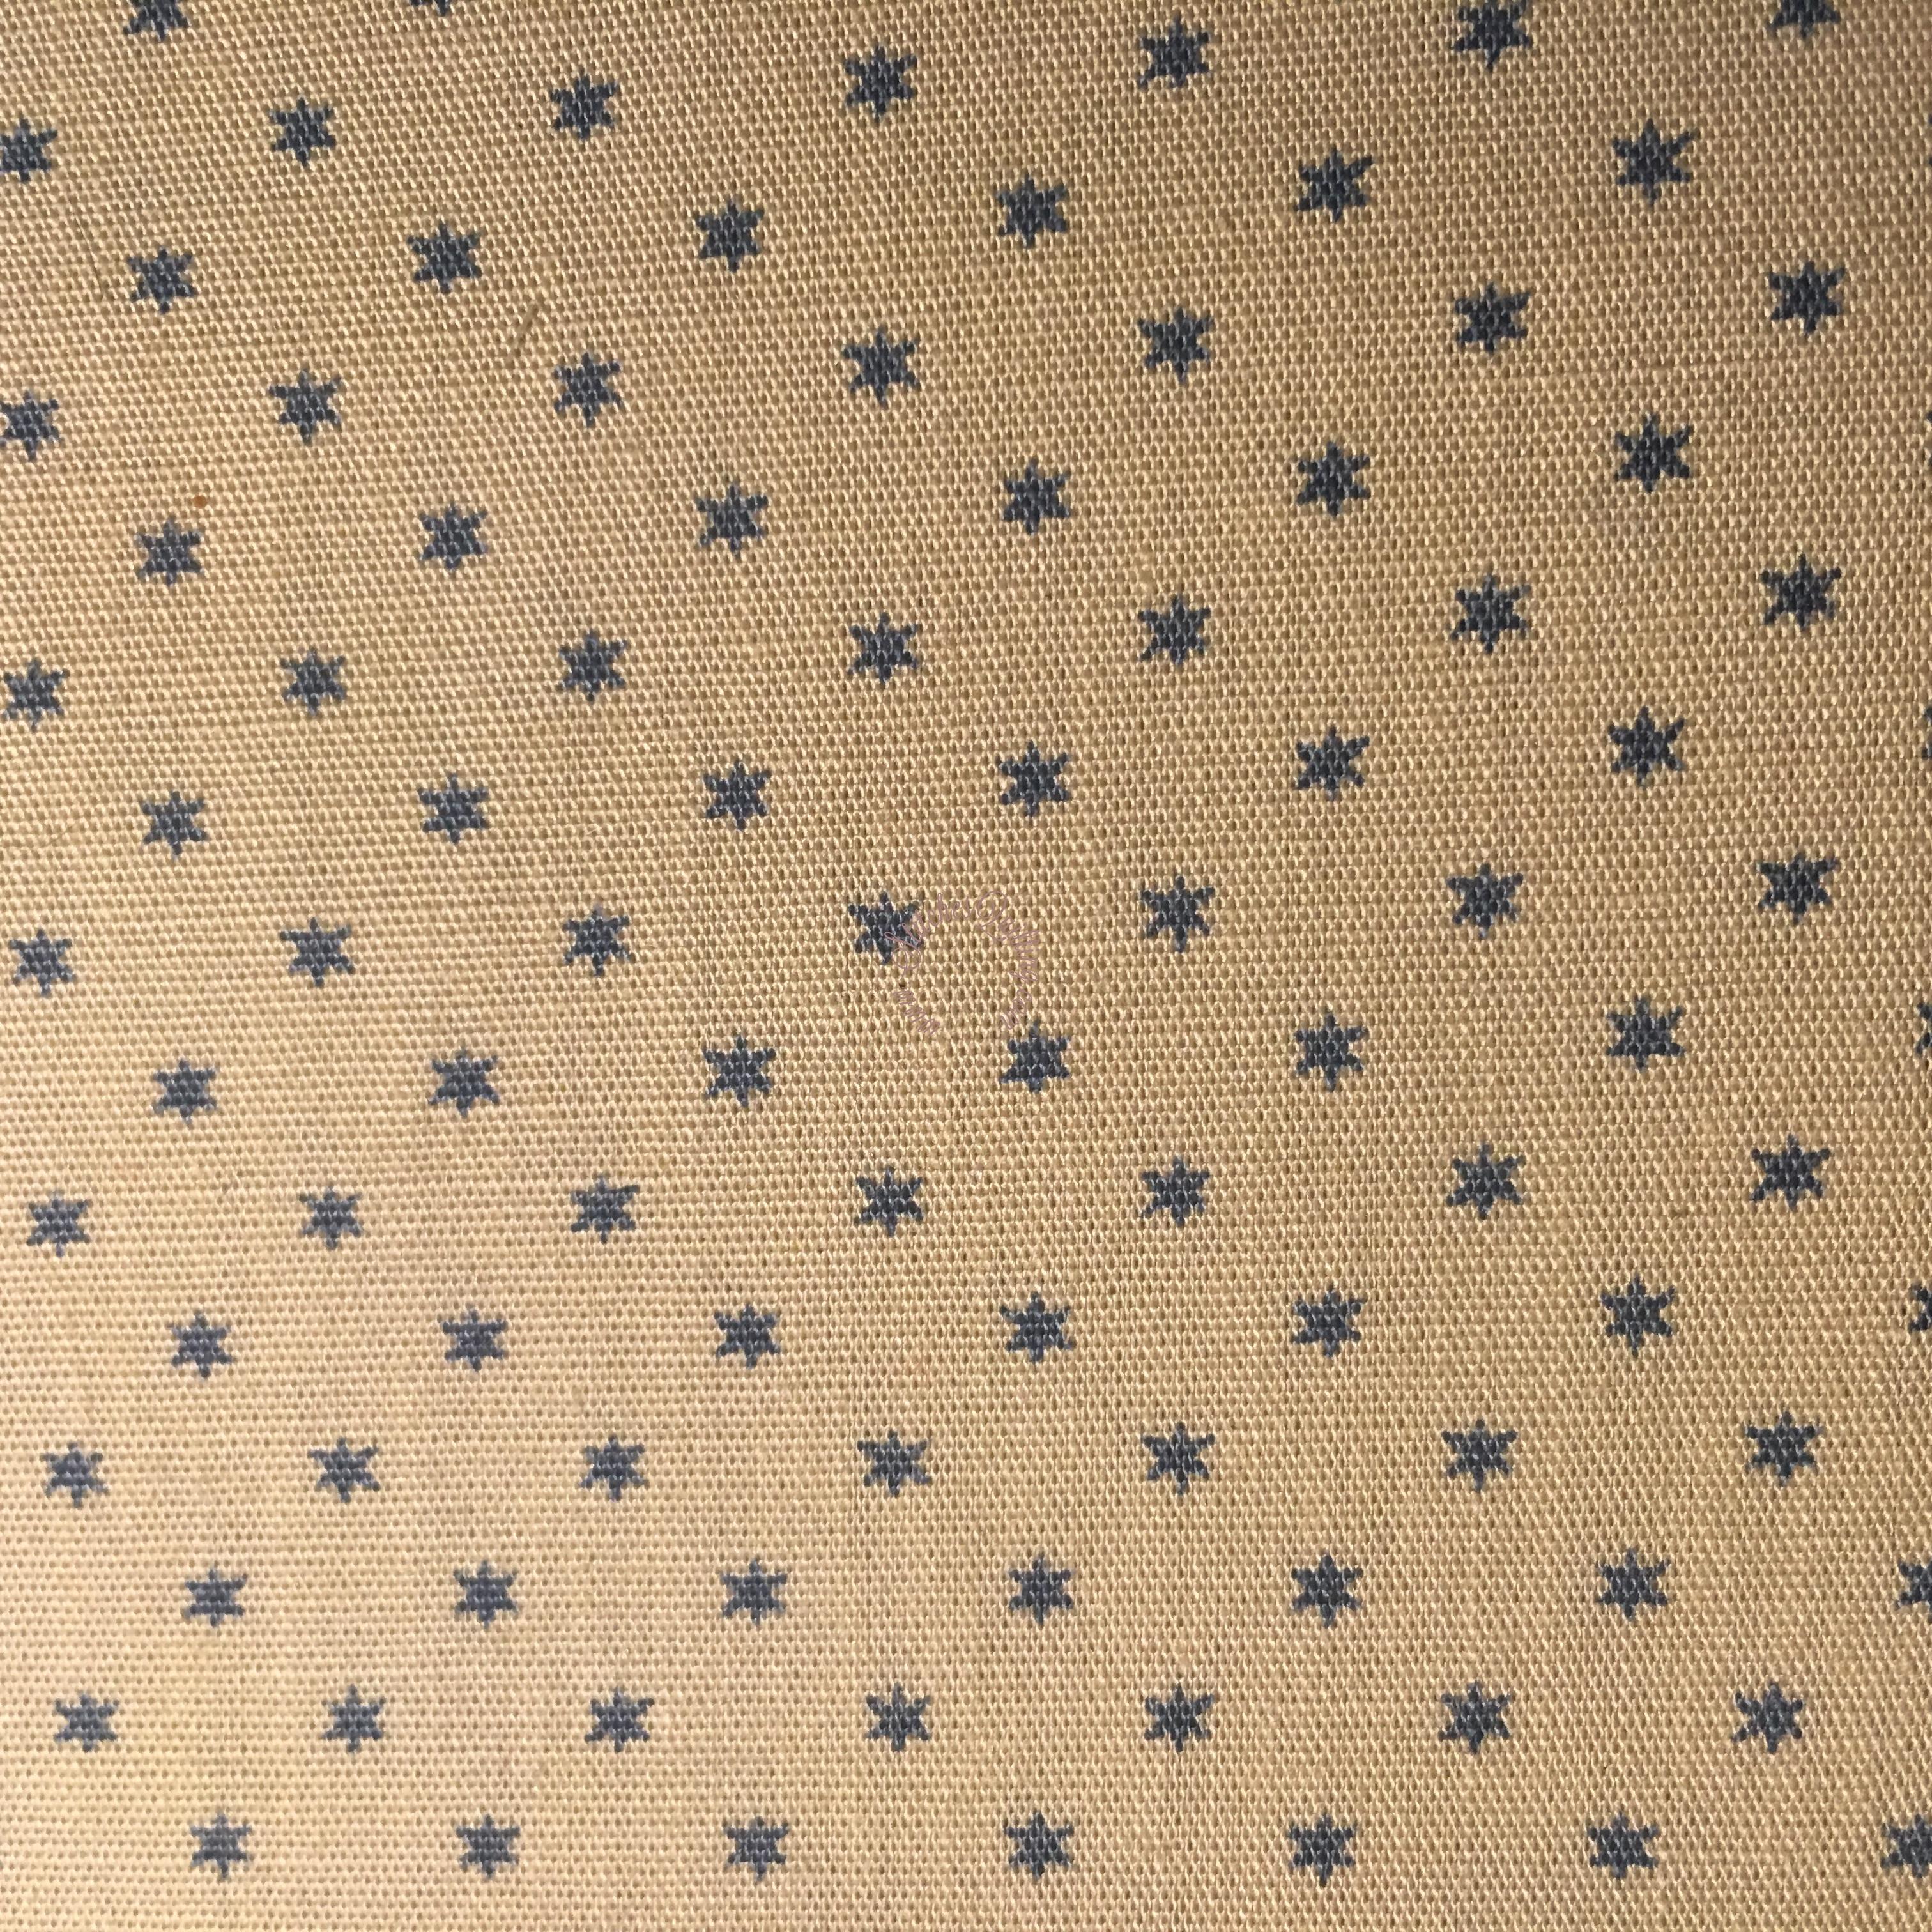 Moda Vintage Workshop Tiny Blue Stars Cream Fabric Indygo